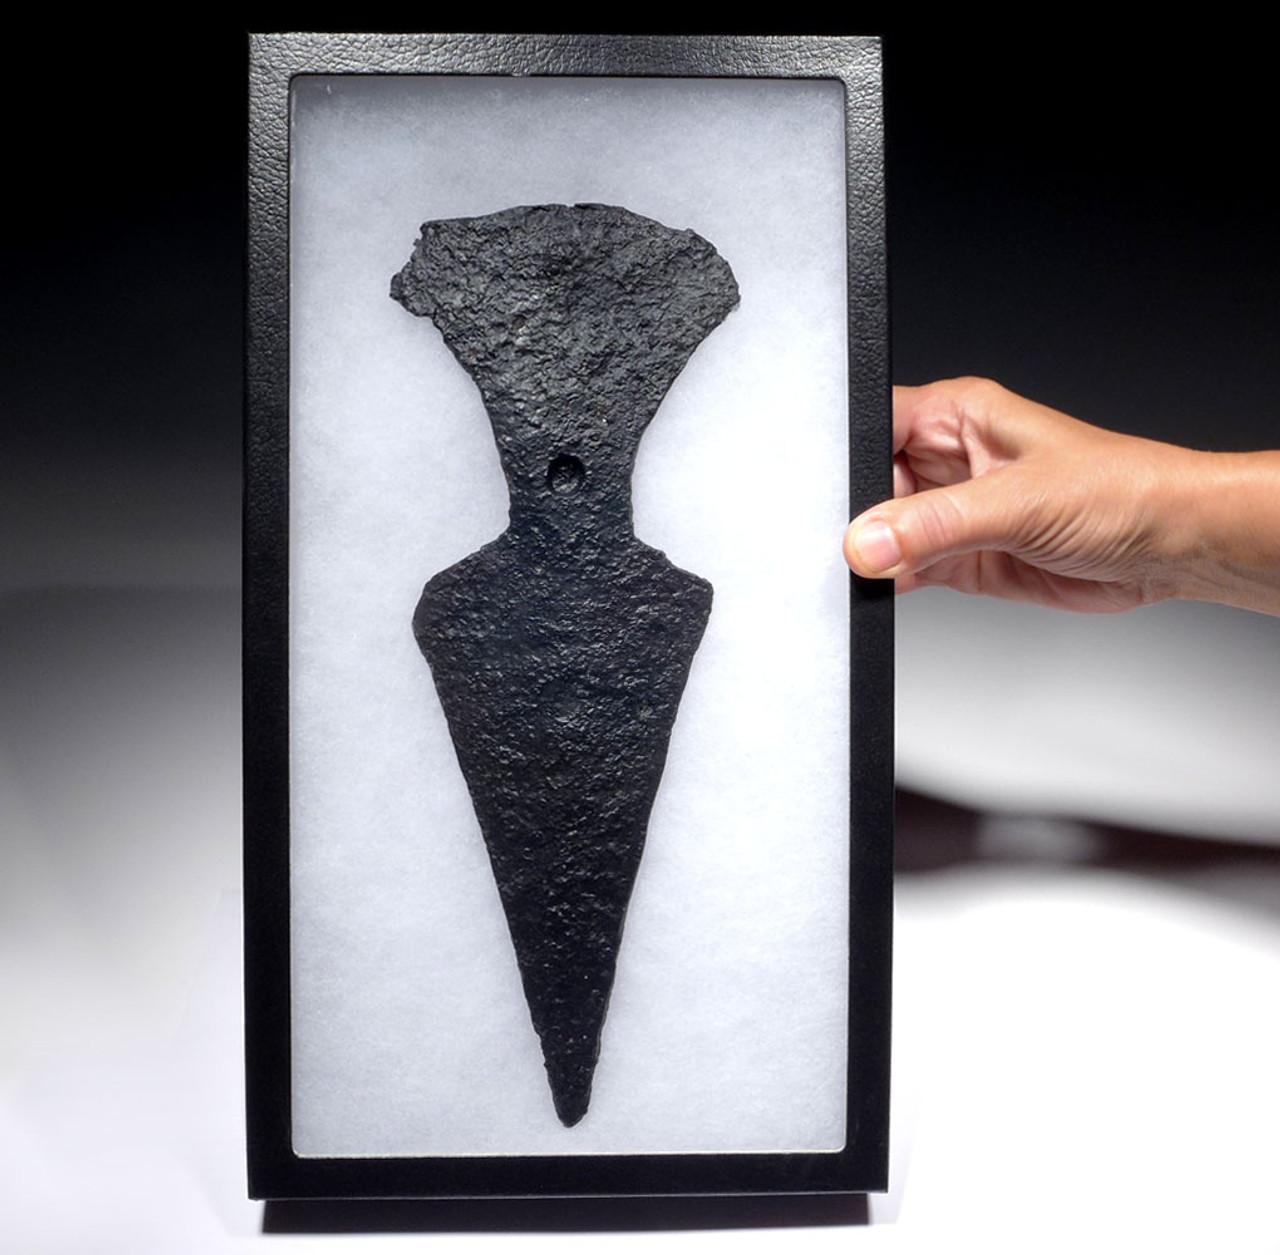 EXTREMELY RARE ANCIENT SAKA SCYTHIAN IRON HORSE CHANFRON HEAD ARMOR PLATE  *R298